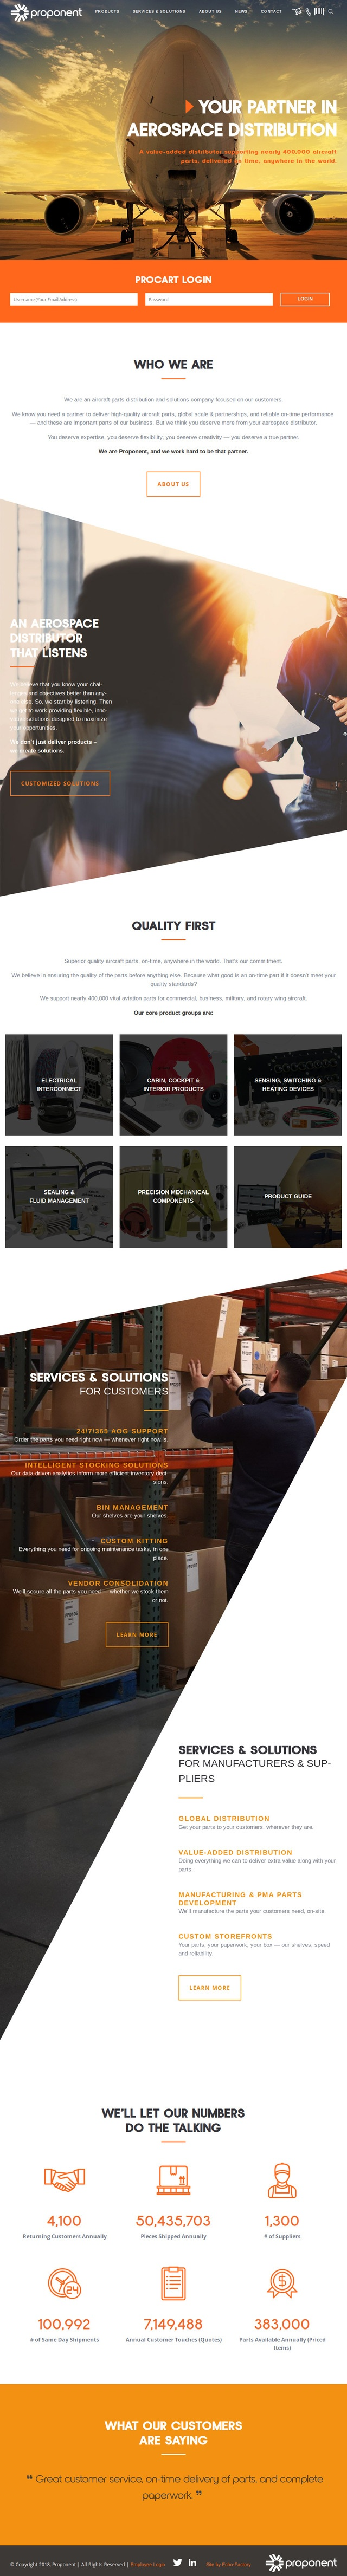 kapco-global.com